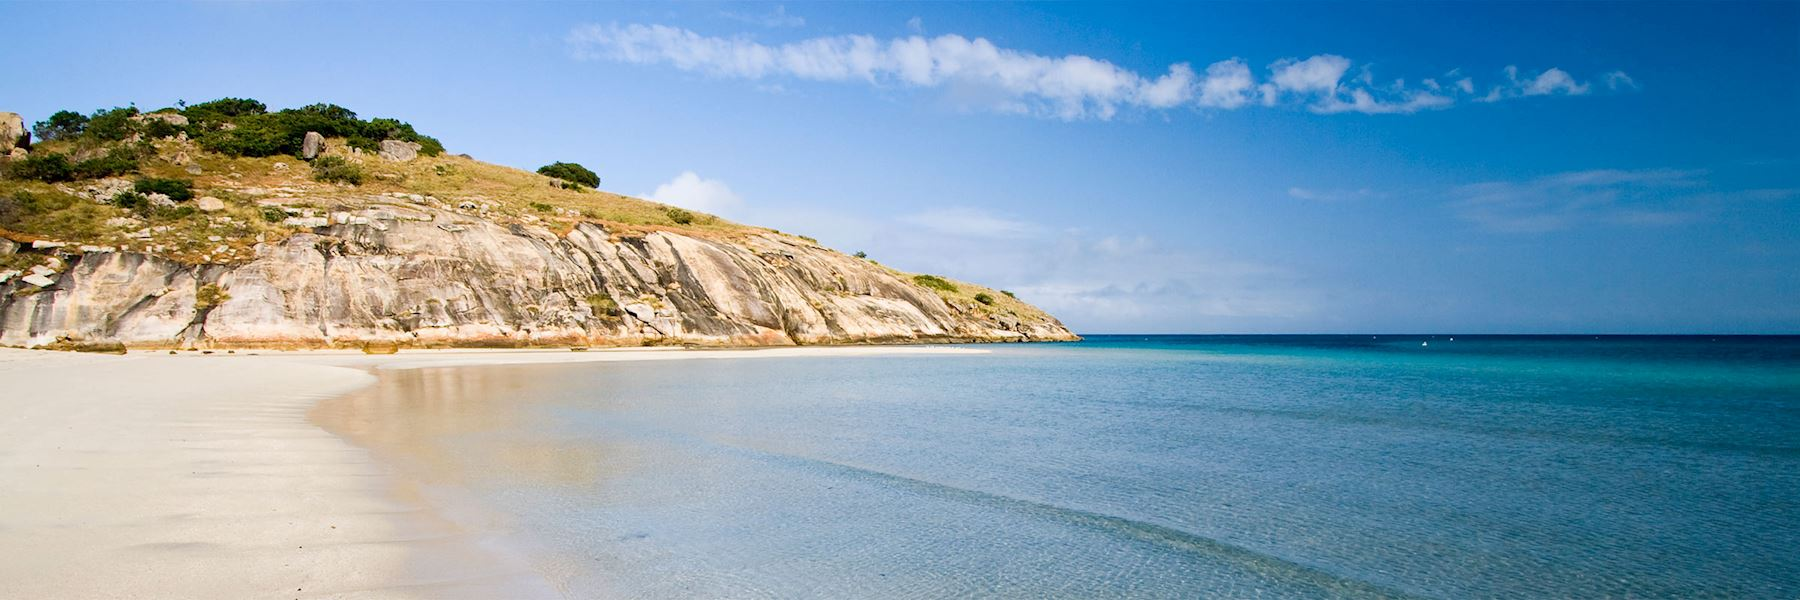 Visit Lizard Island, Australia